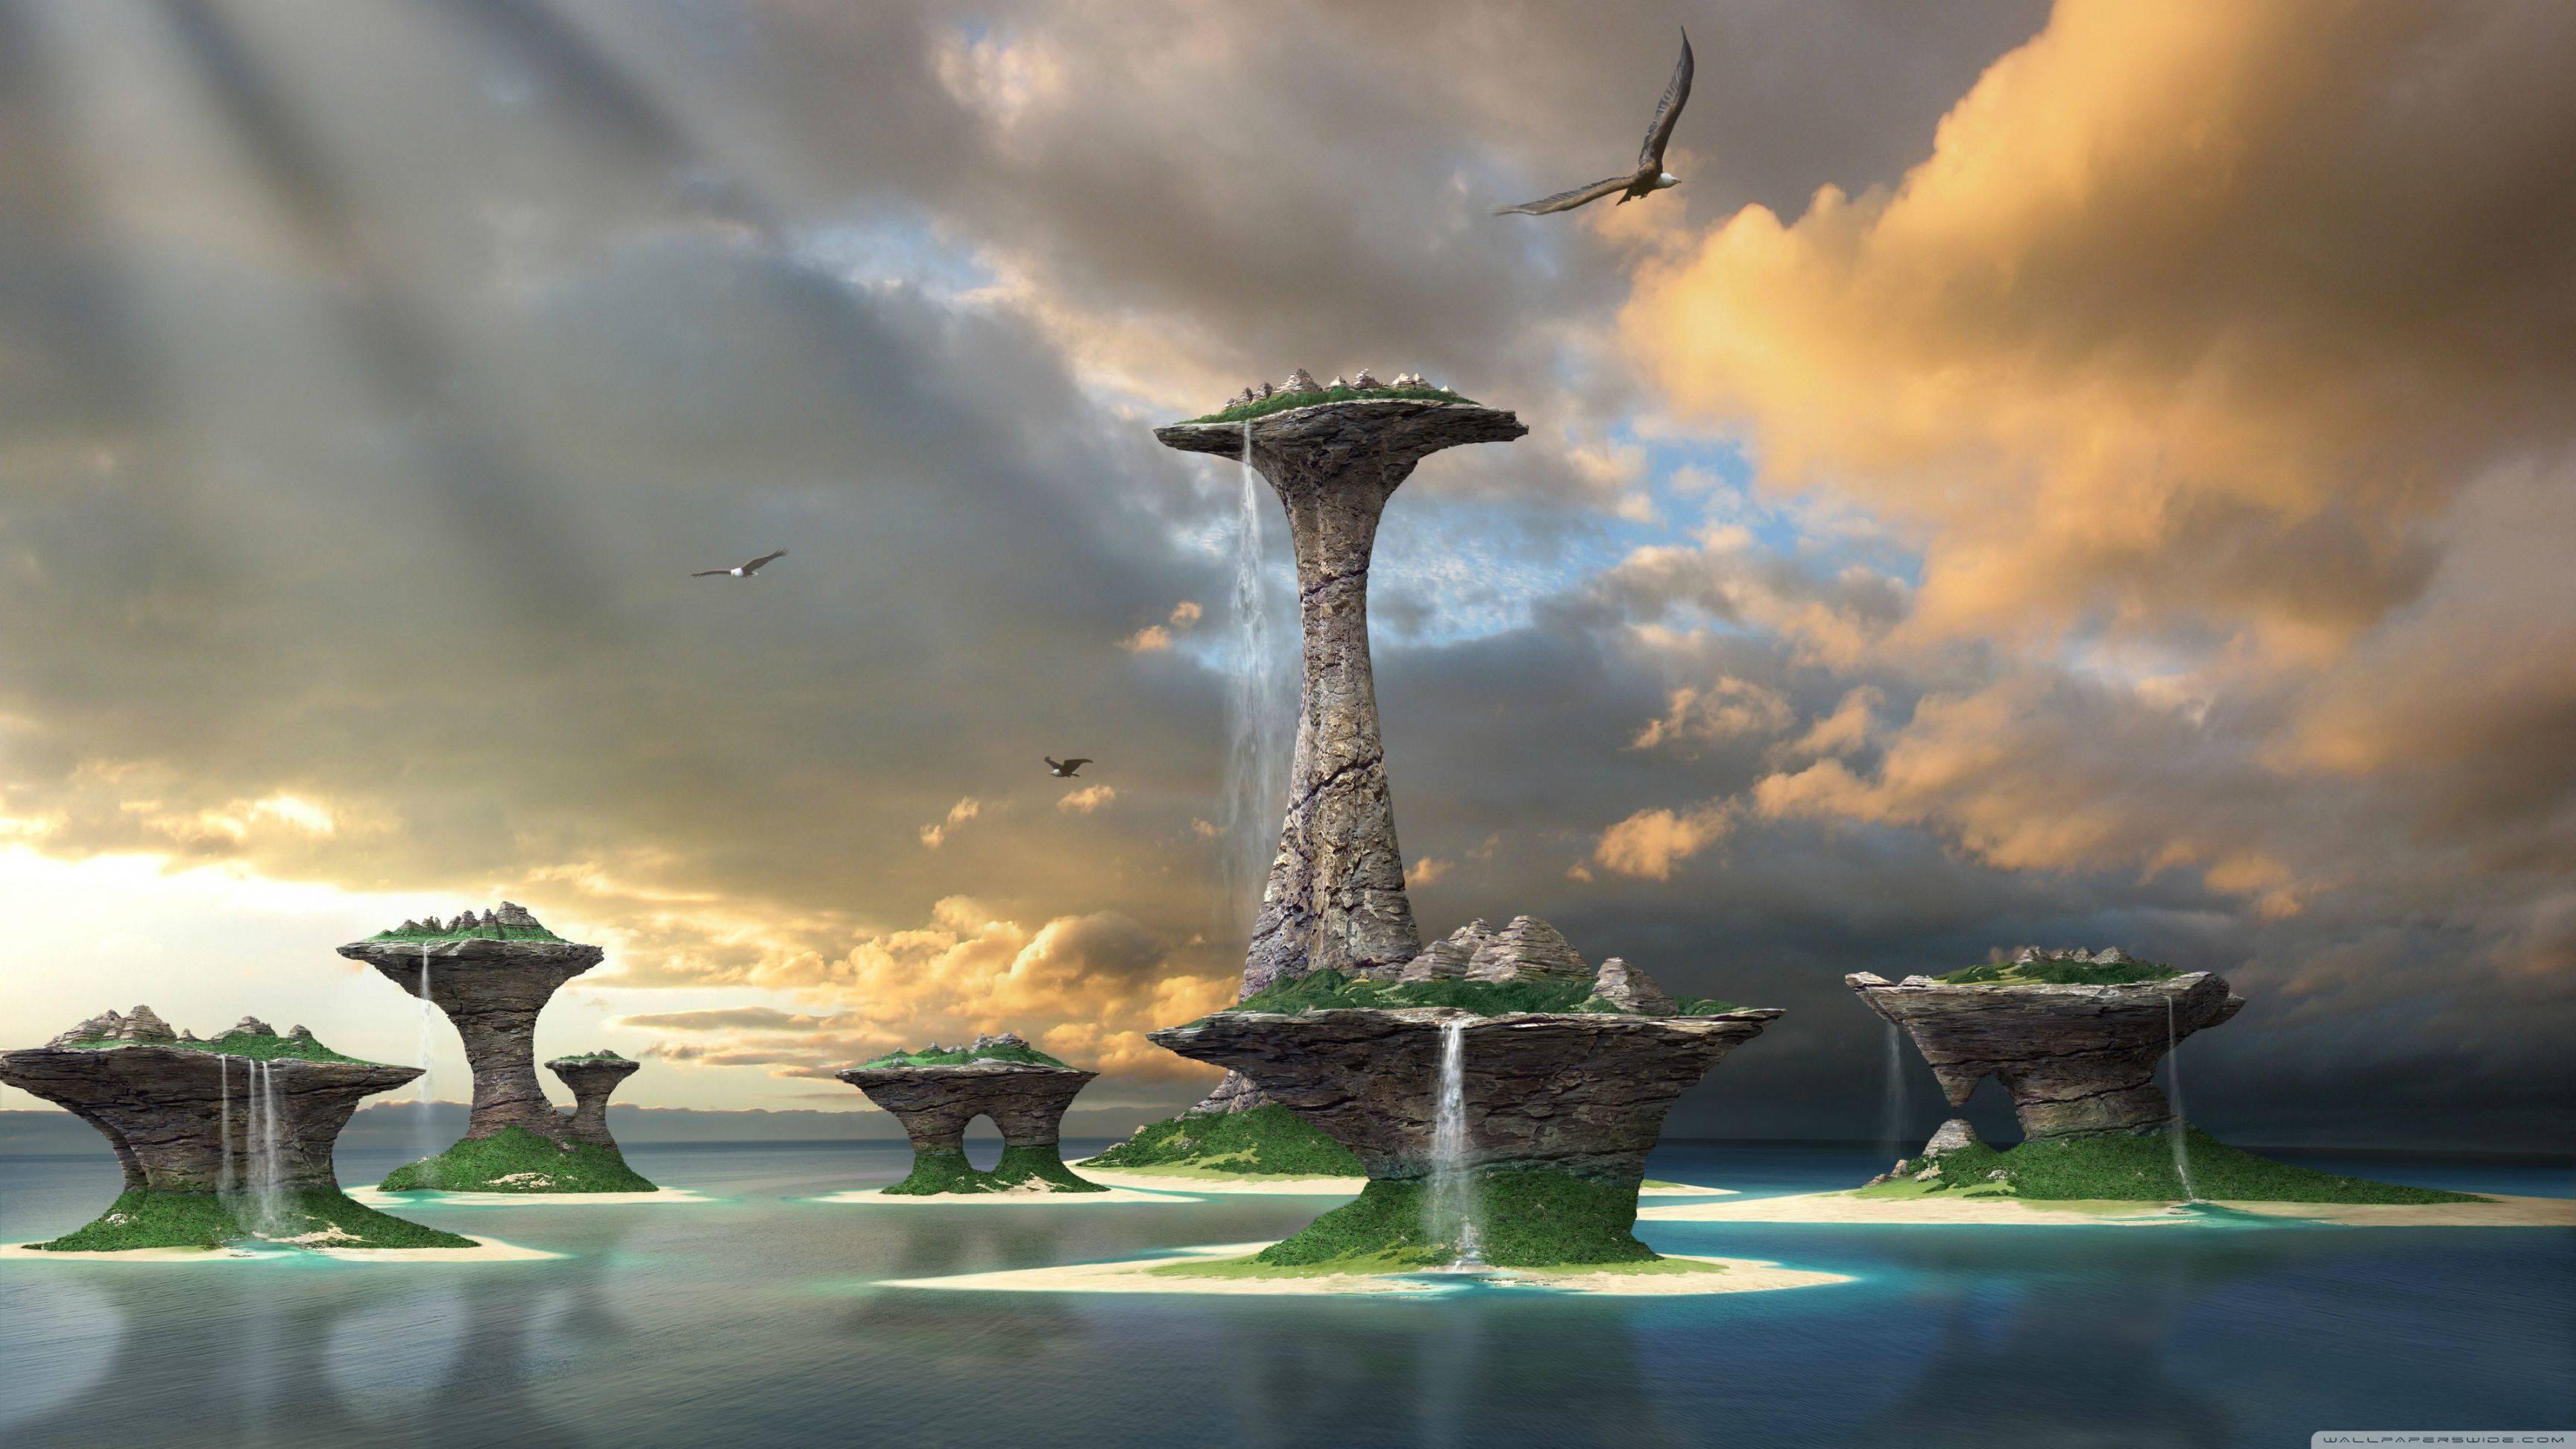 alien world desktop wallpaper - wallpapersafari